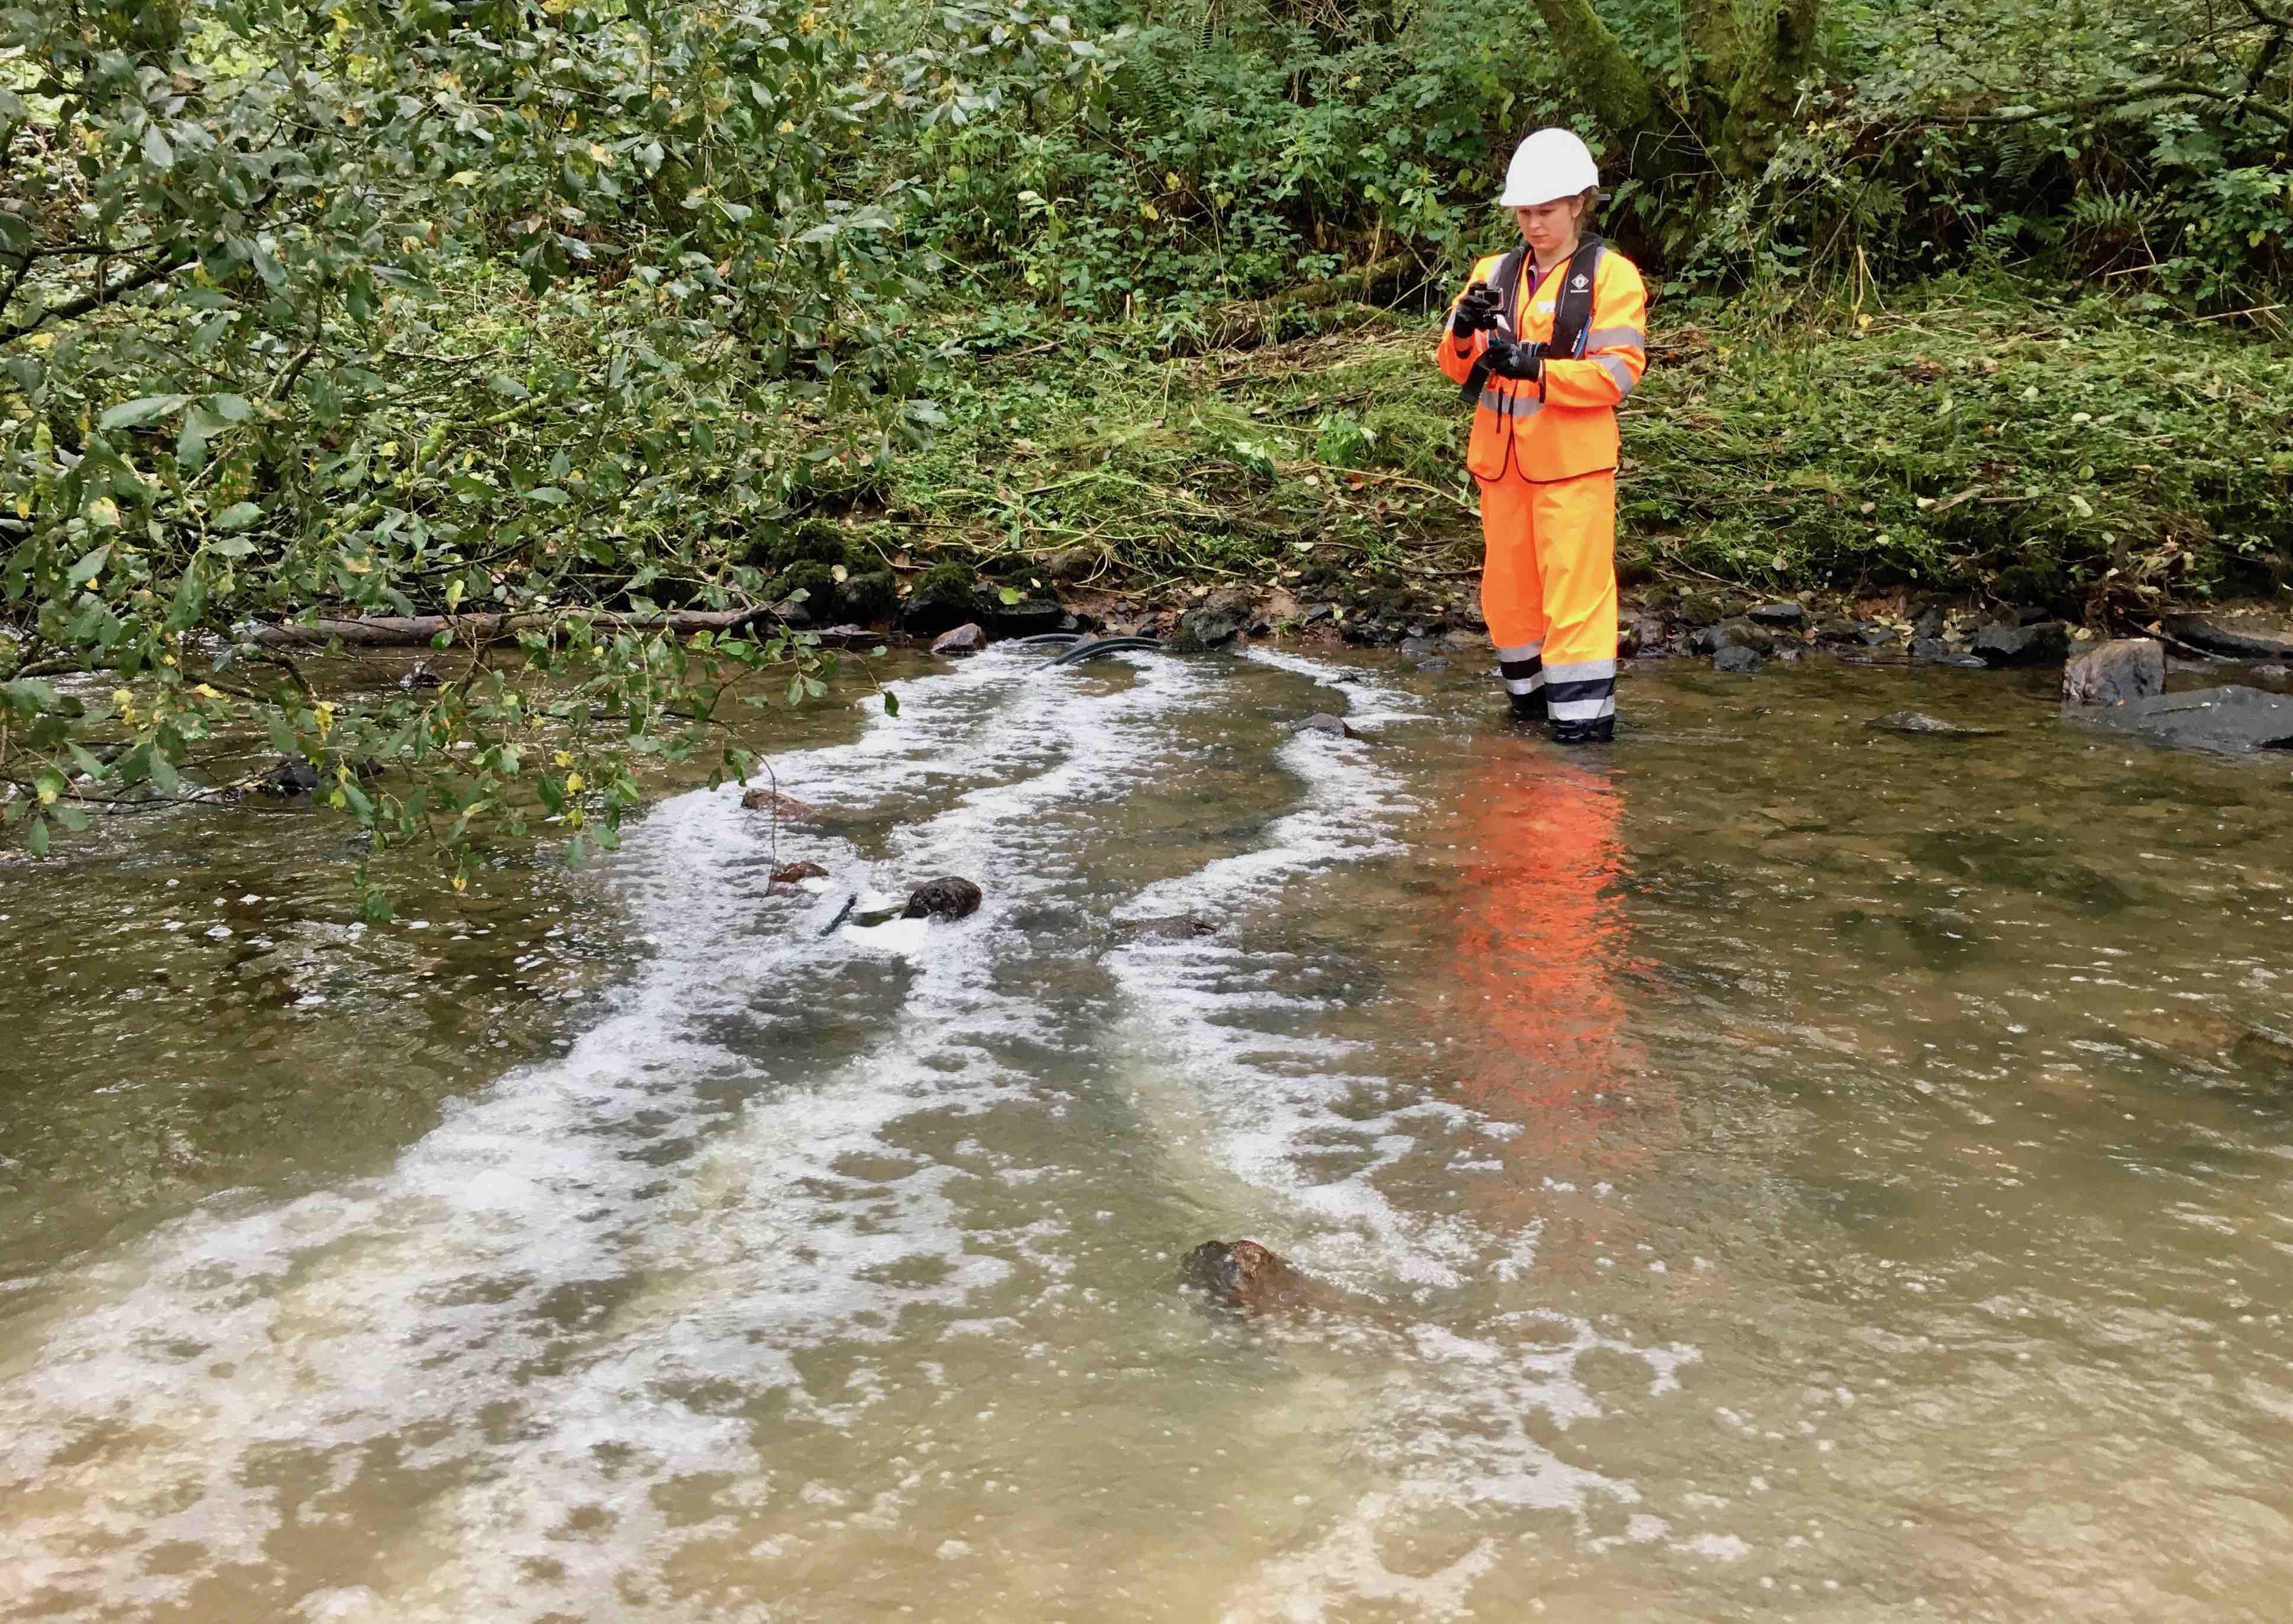 Using 4 lines of Bubble Tubing on Afon Gwili